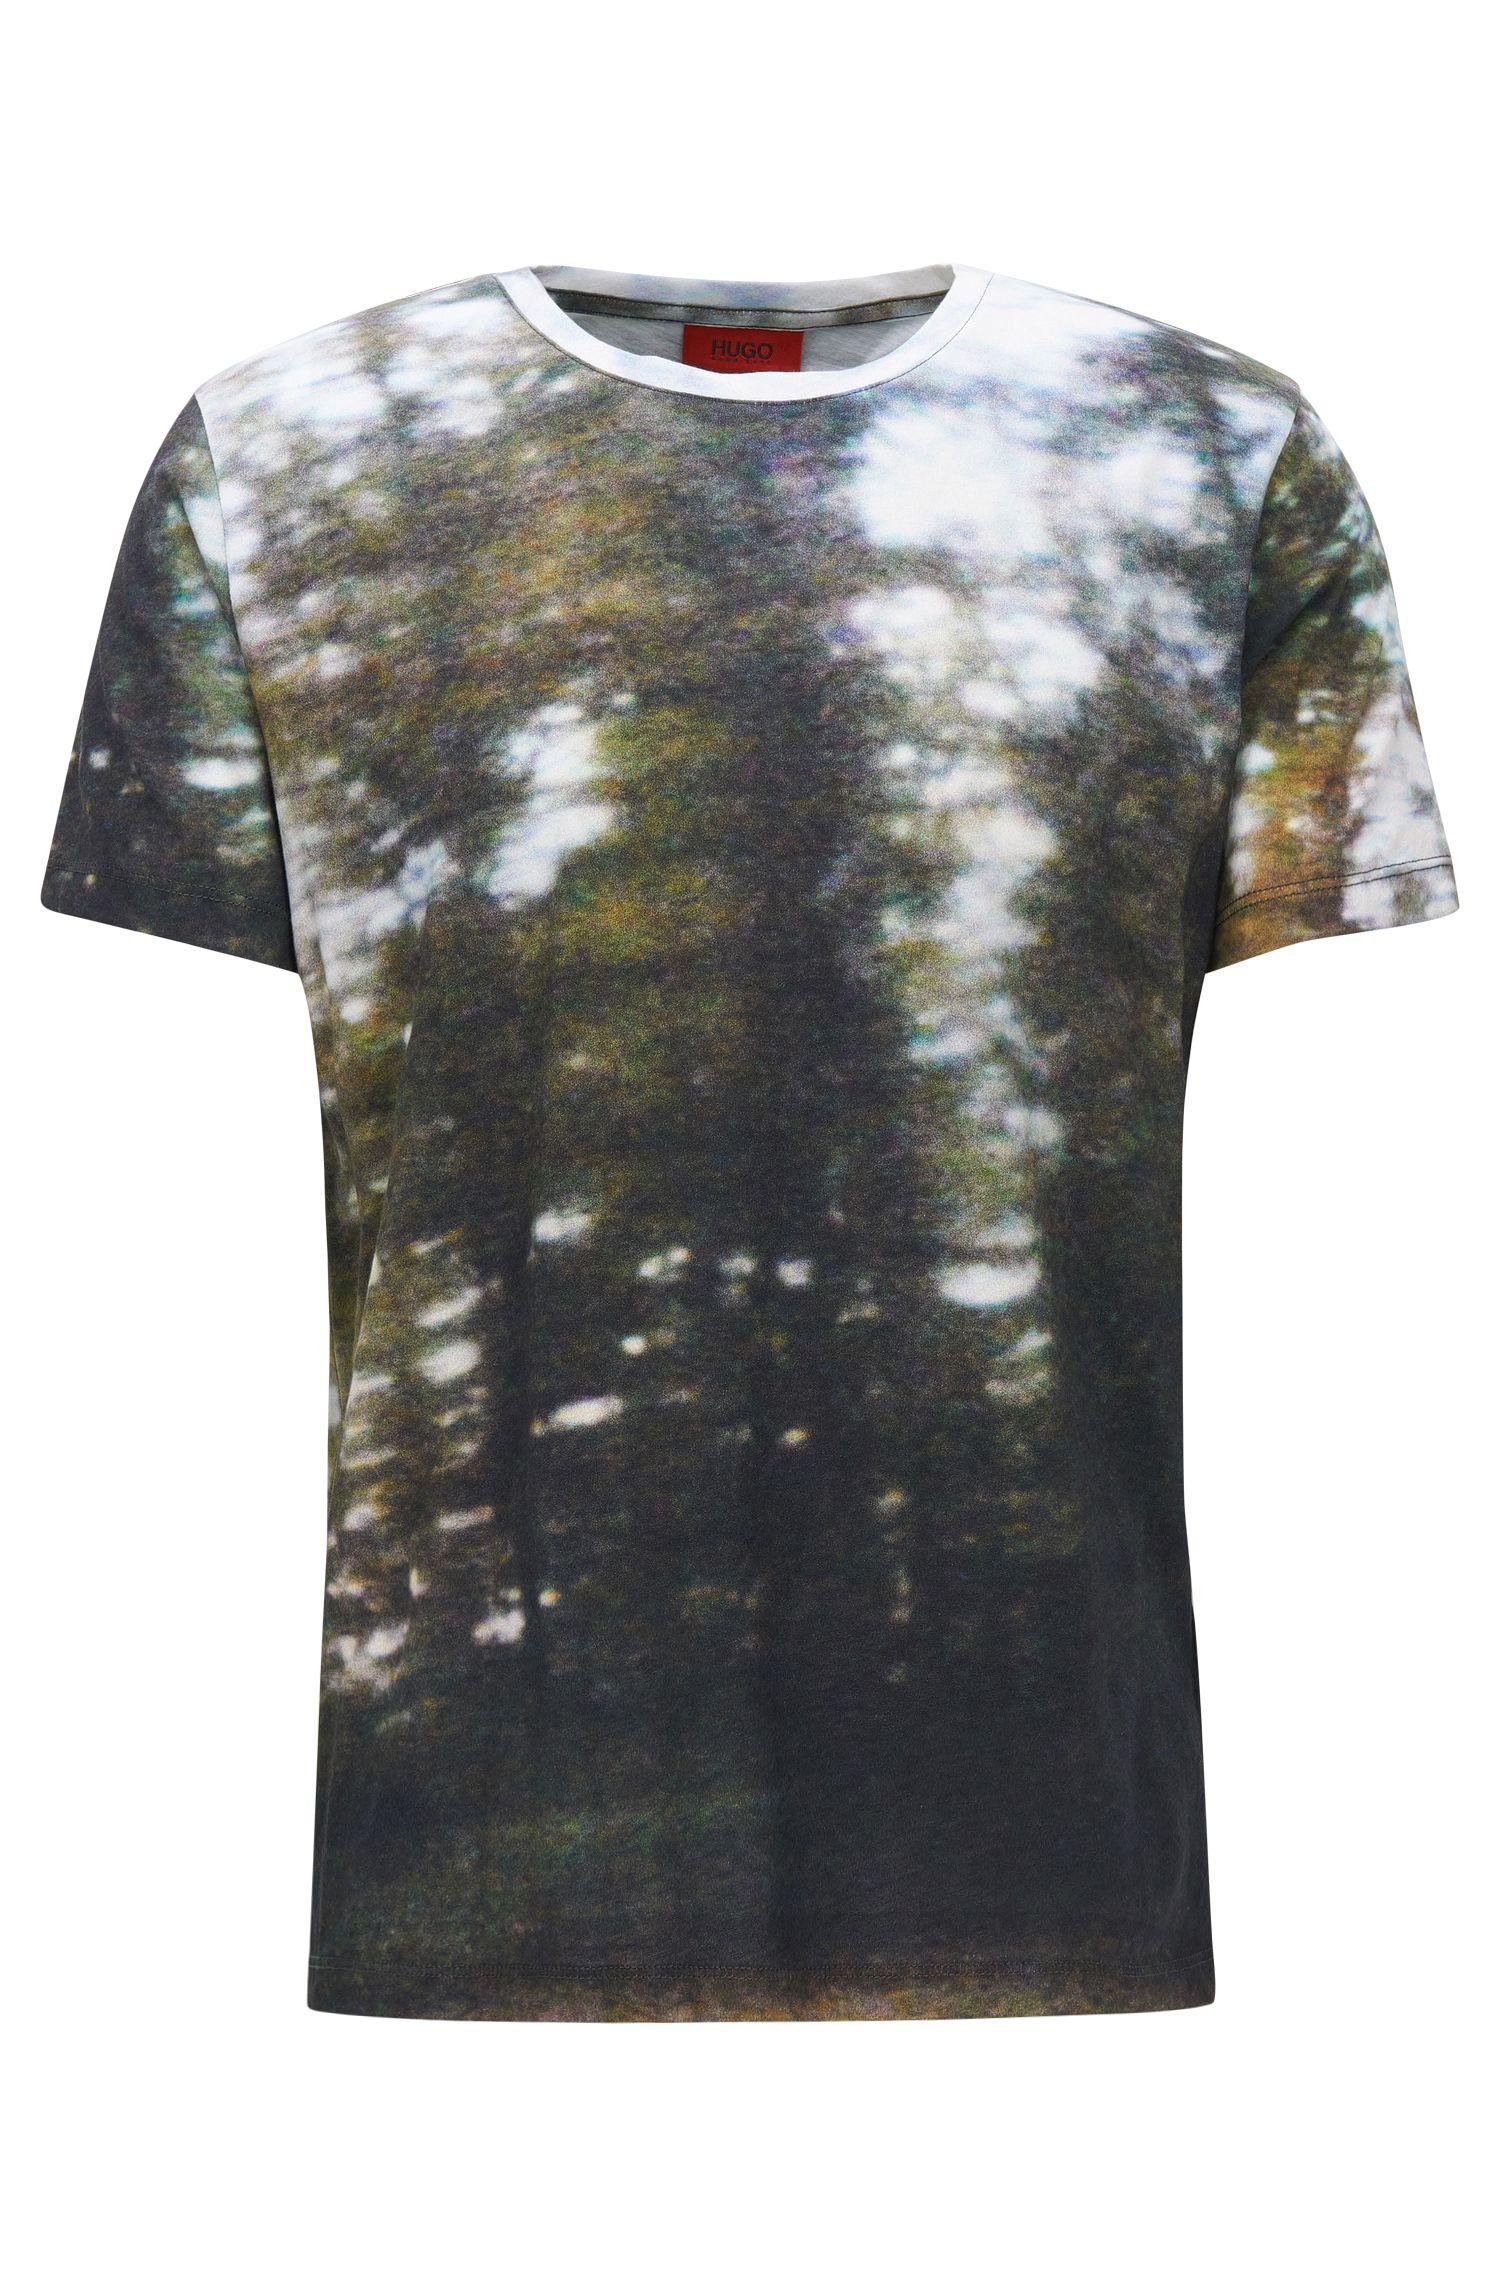 Cotton Digital-Print T-Shirt | Darview